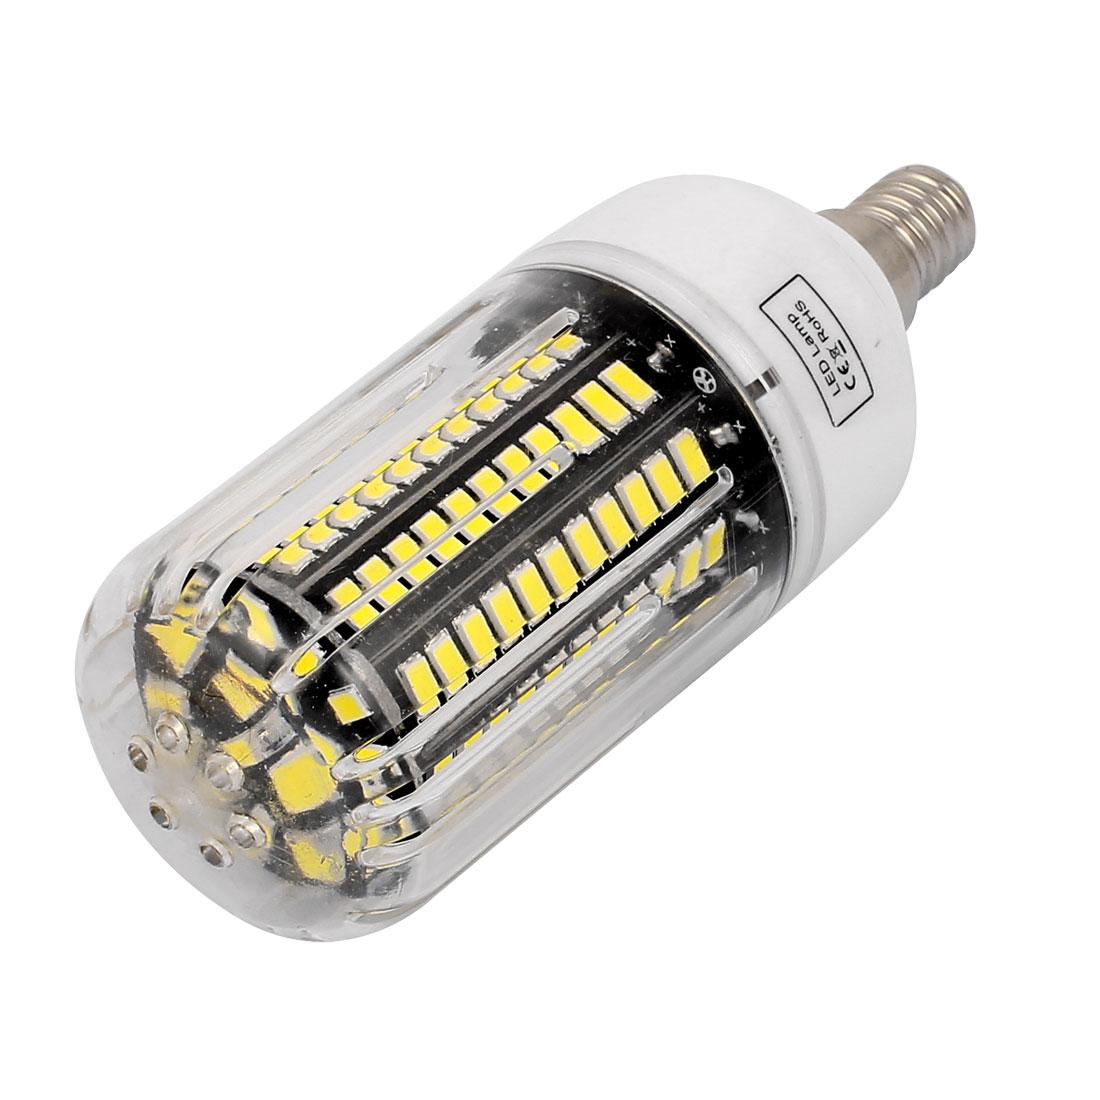 85V~265V 15W 130 x 5736SMD E14 LED Corn Bulb Light Lamp Energy Saving Pure White